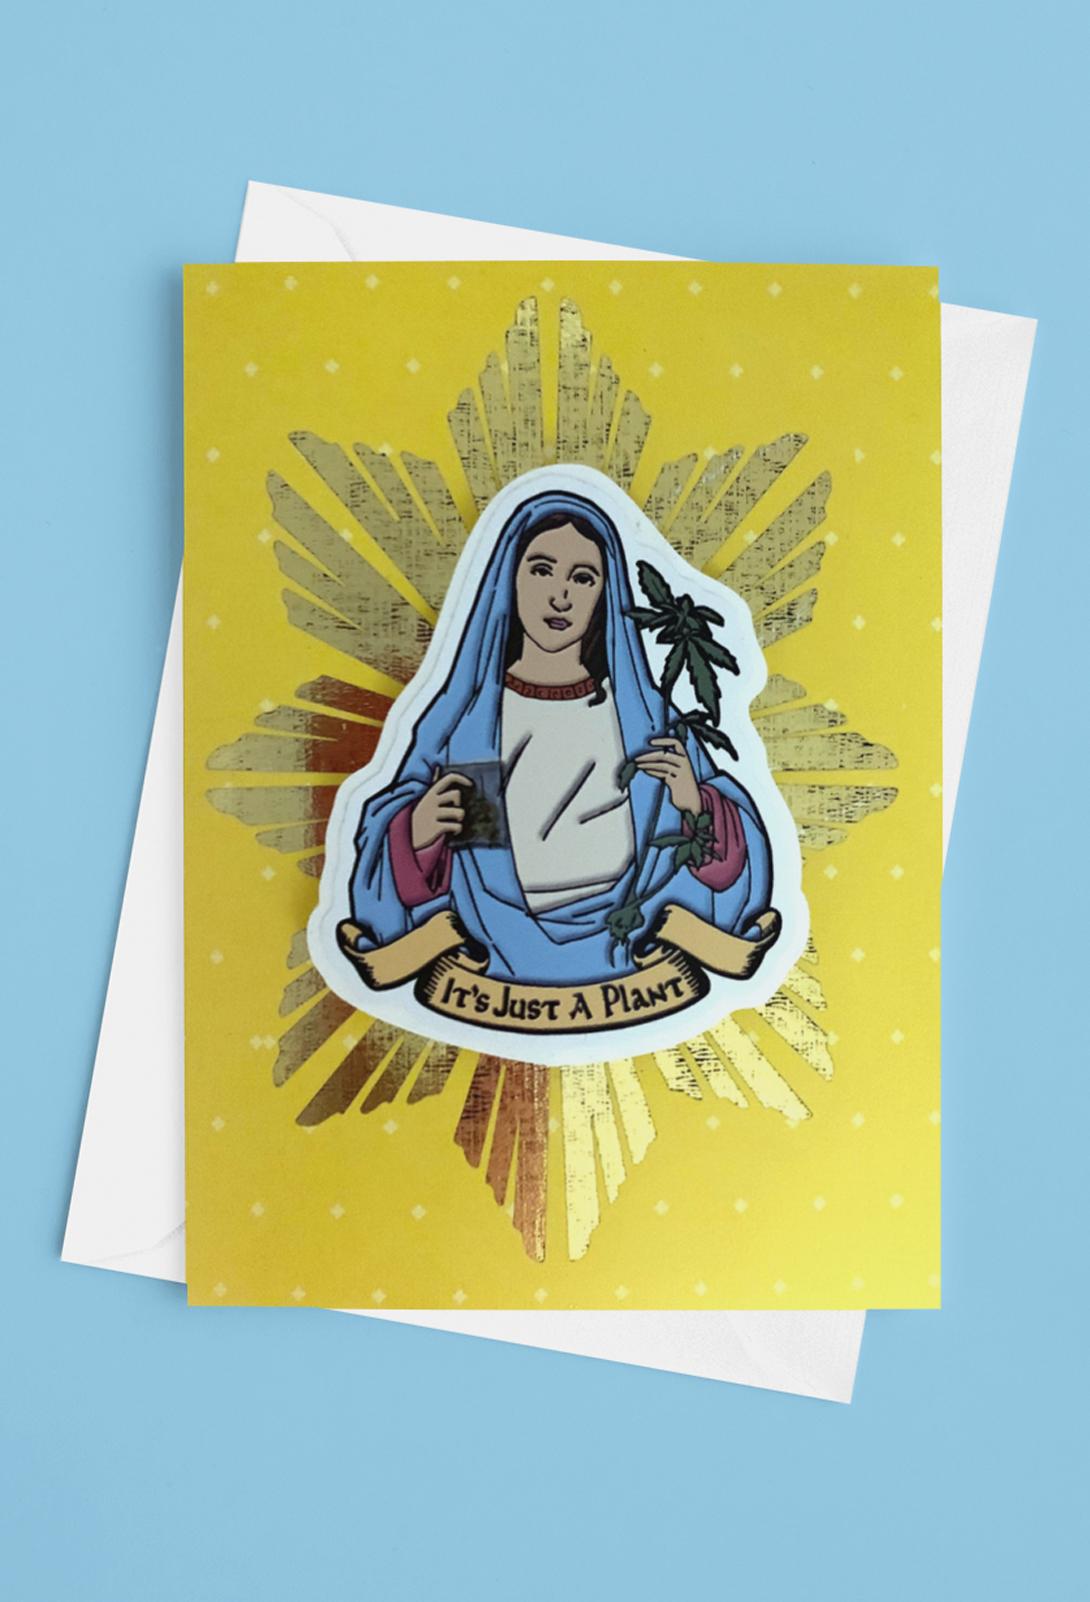 just get high_sticker card_maryjane_new